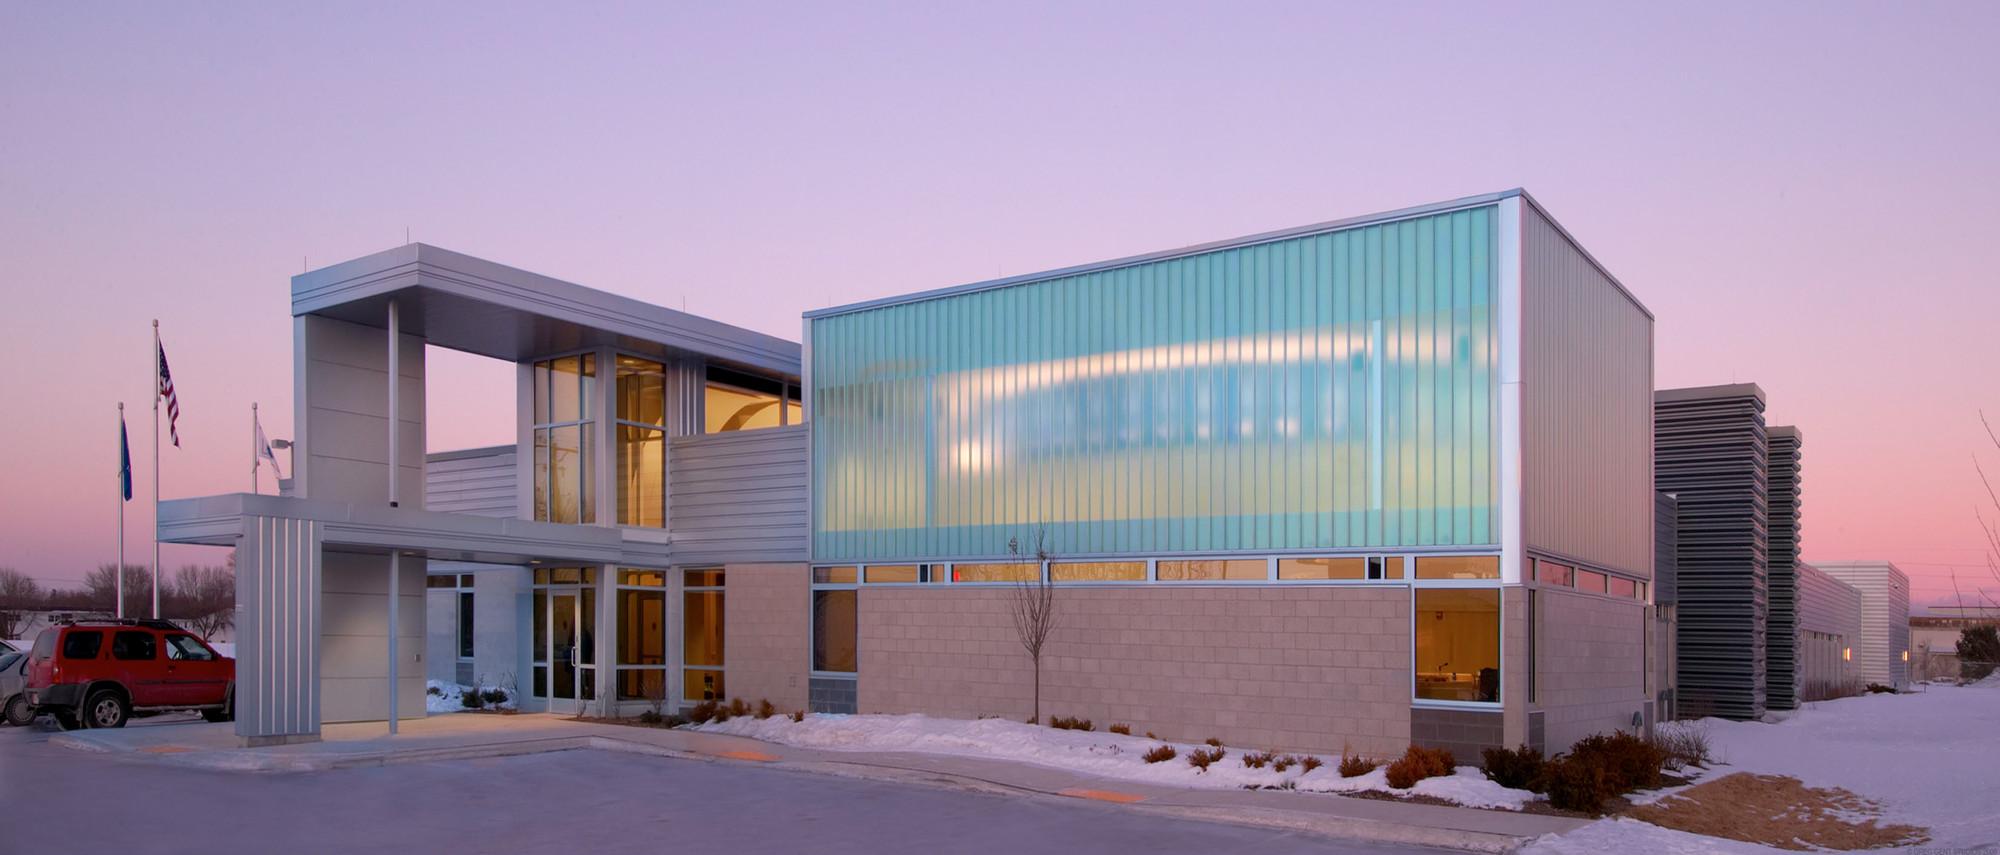 Best Architecture Building Design